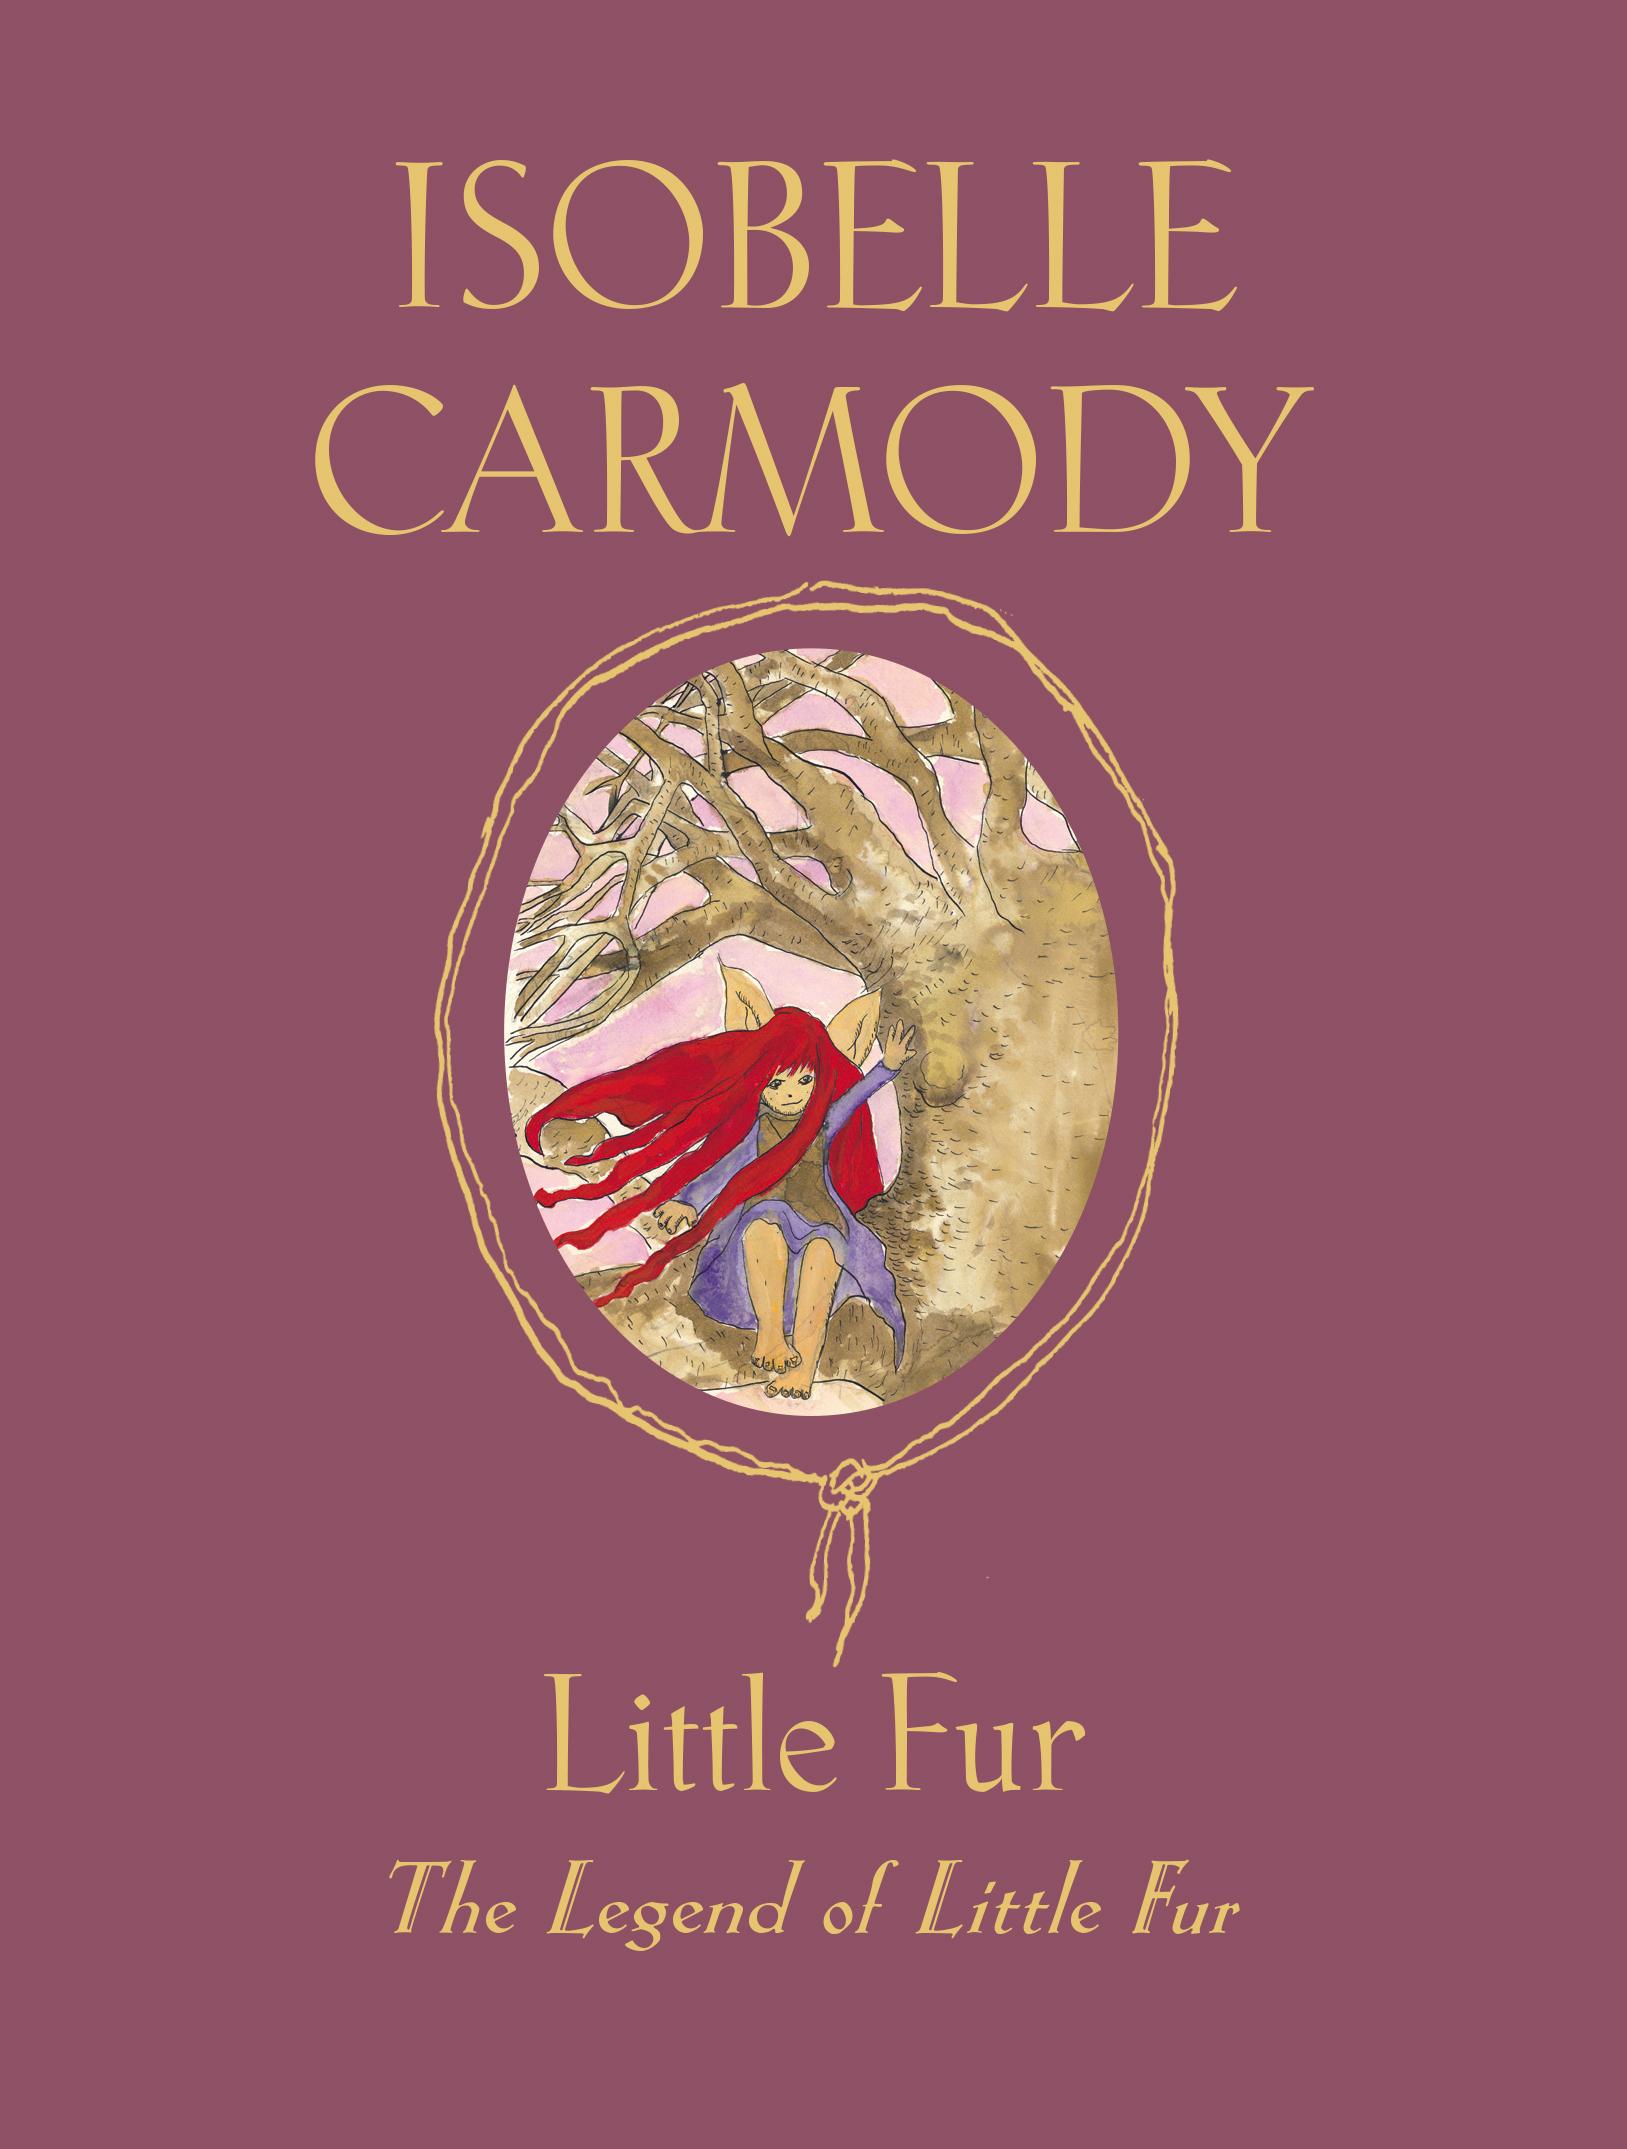 Little Fur: The Legend of Little Fur